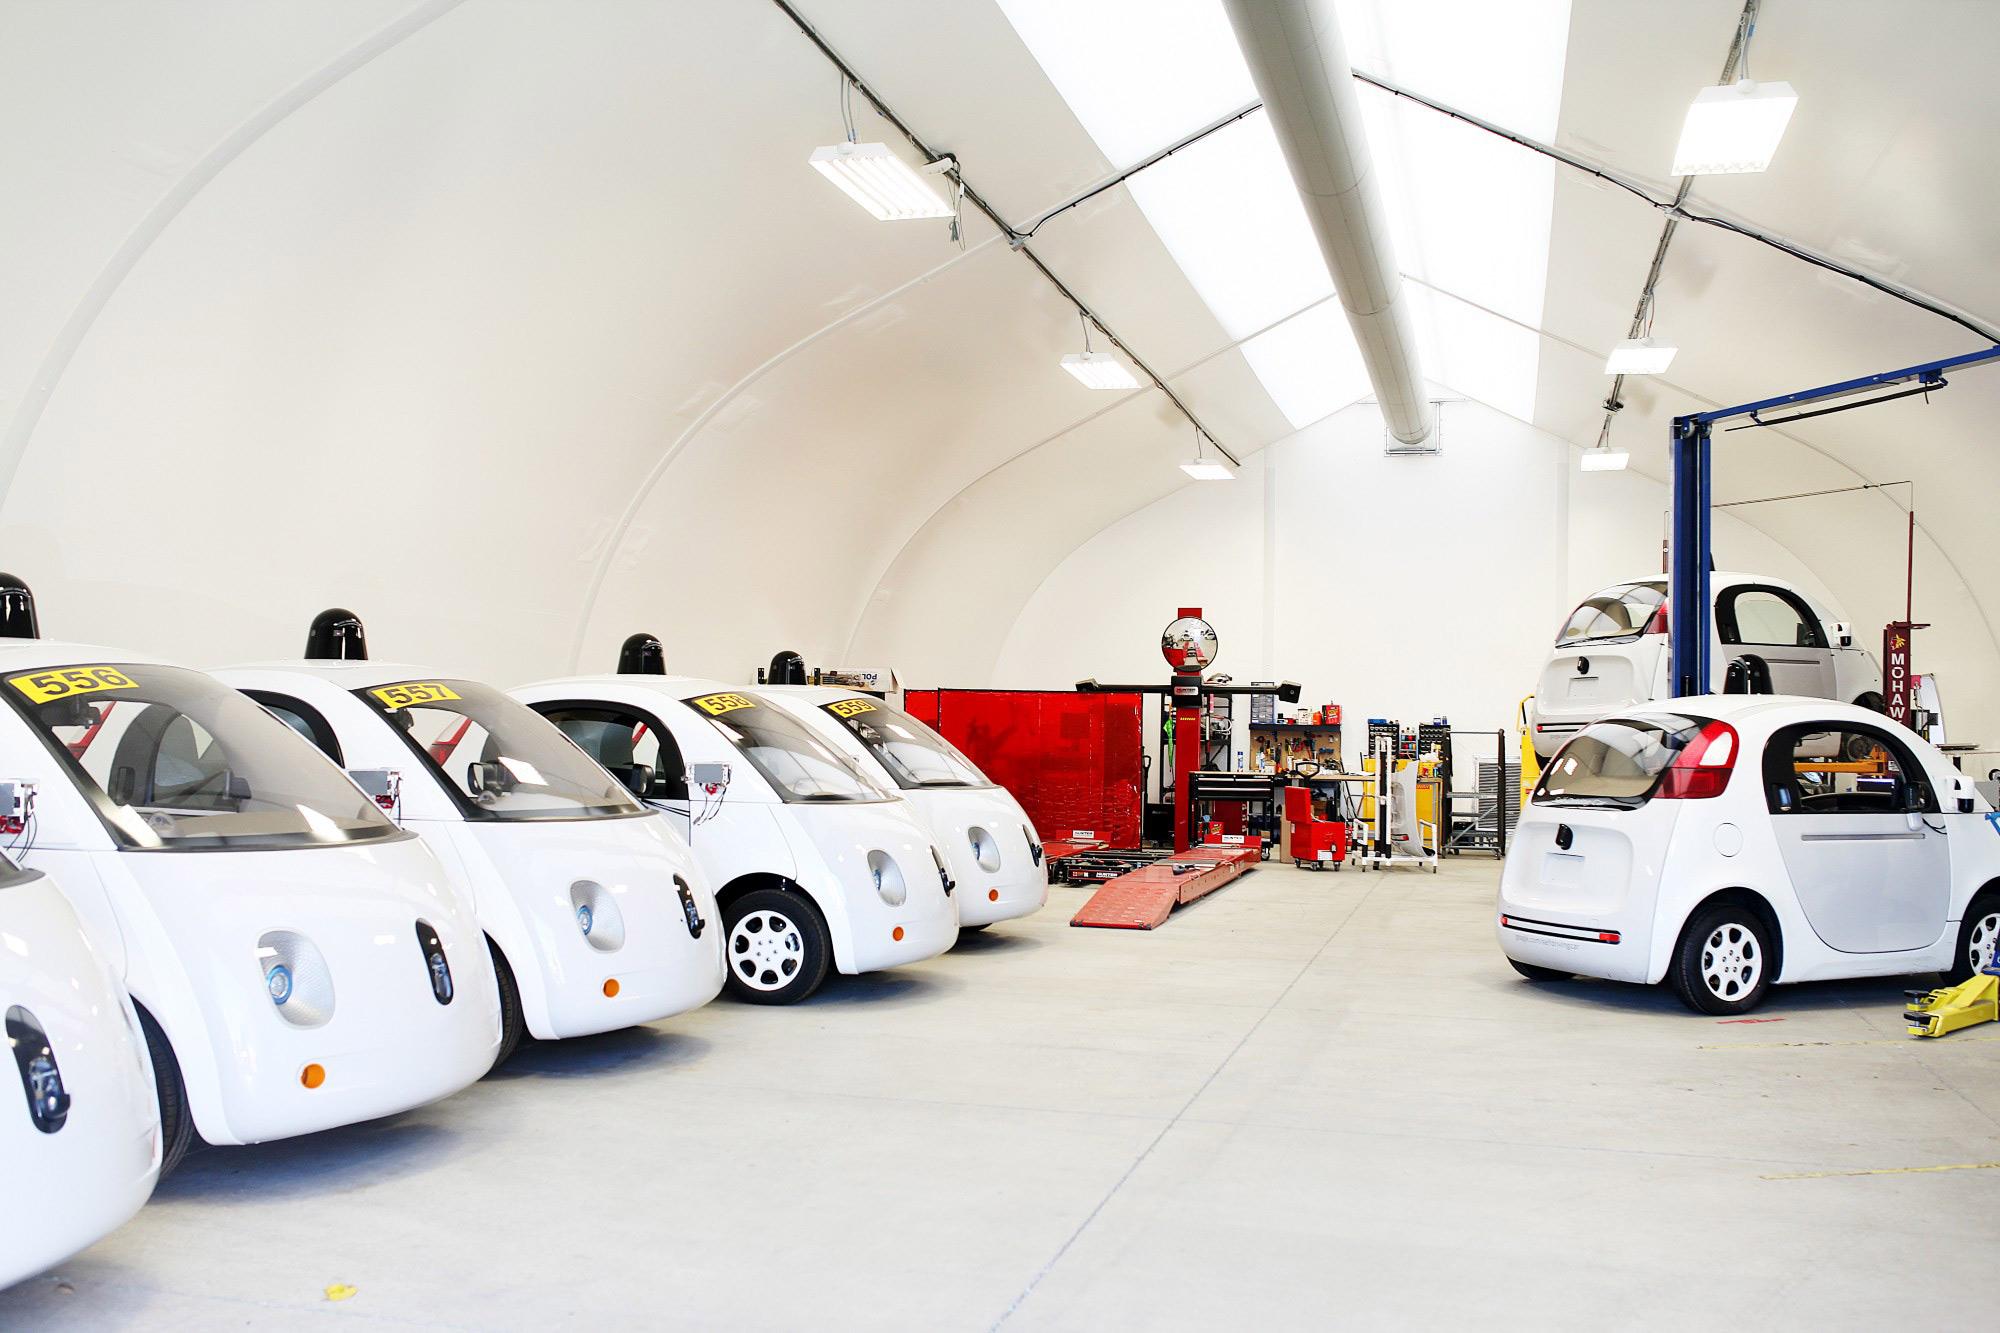 Google Car fleet garage